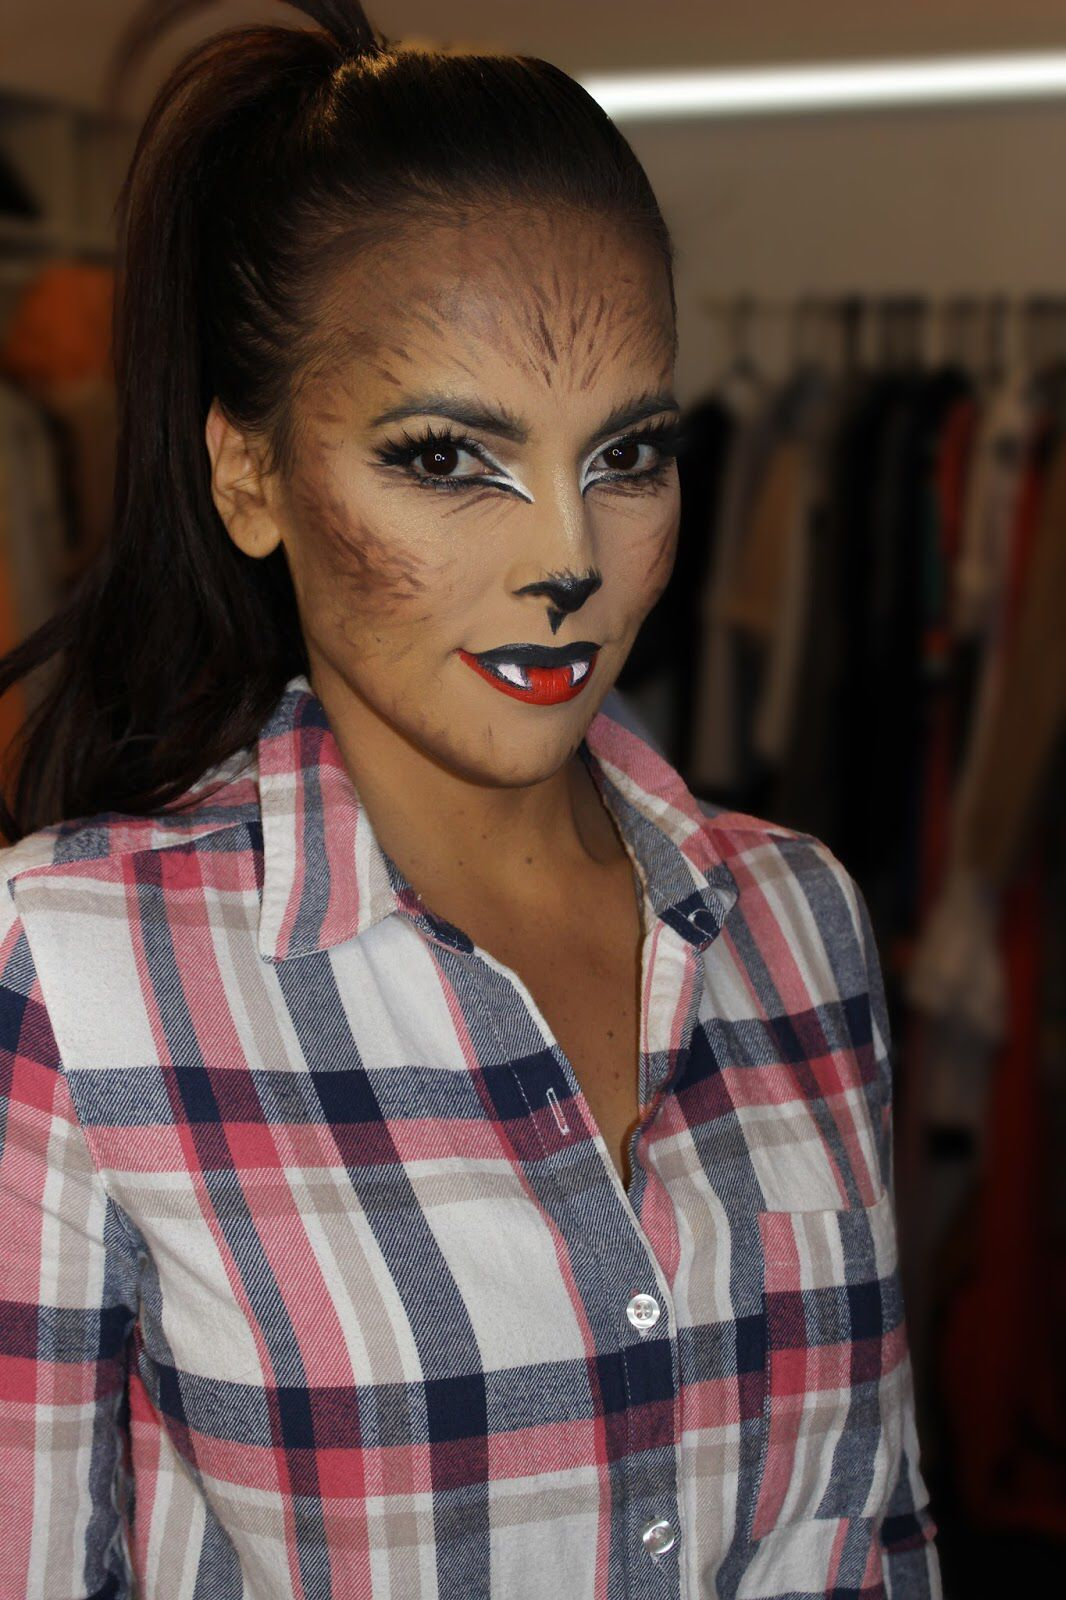 Cute werewolf halloween makeup something simple and the kids will cute werewolf halloween makeup something simple and the kids will love it werewolf makeupwerewolf costume diywerewolf solutioingenieria Choice Image